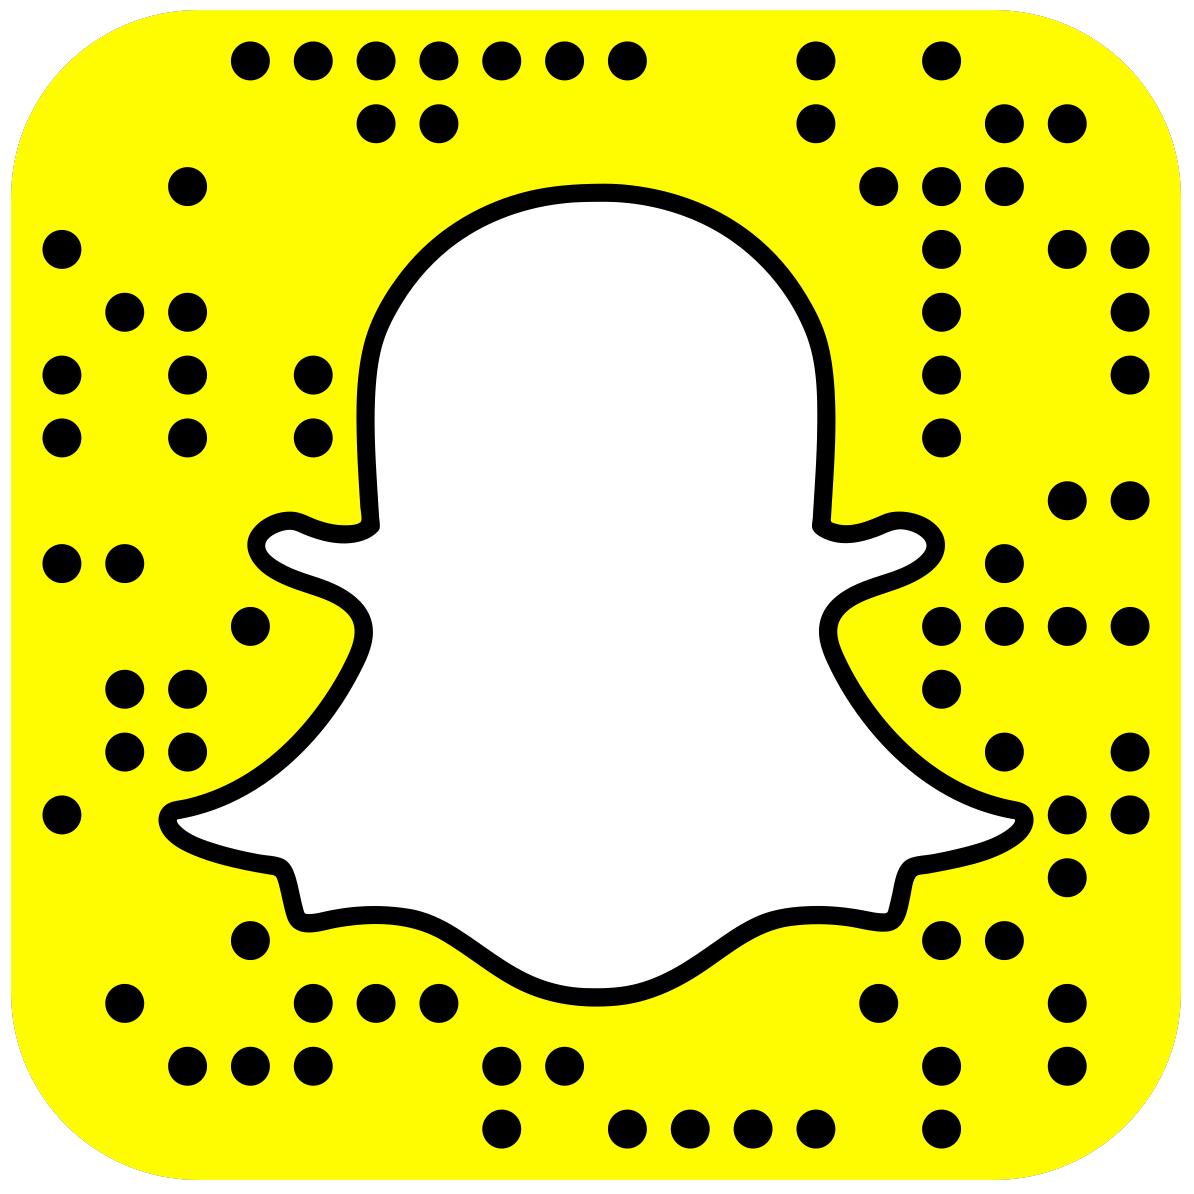 Zoe Saldana Snapchat username